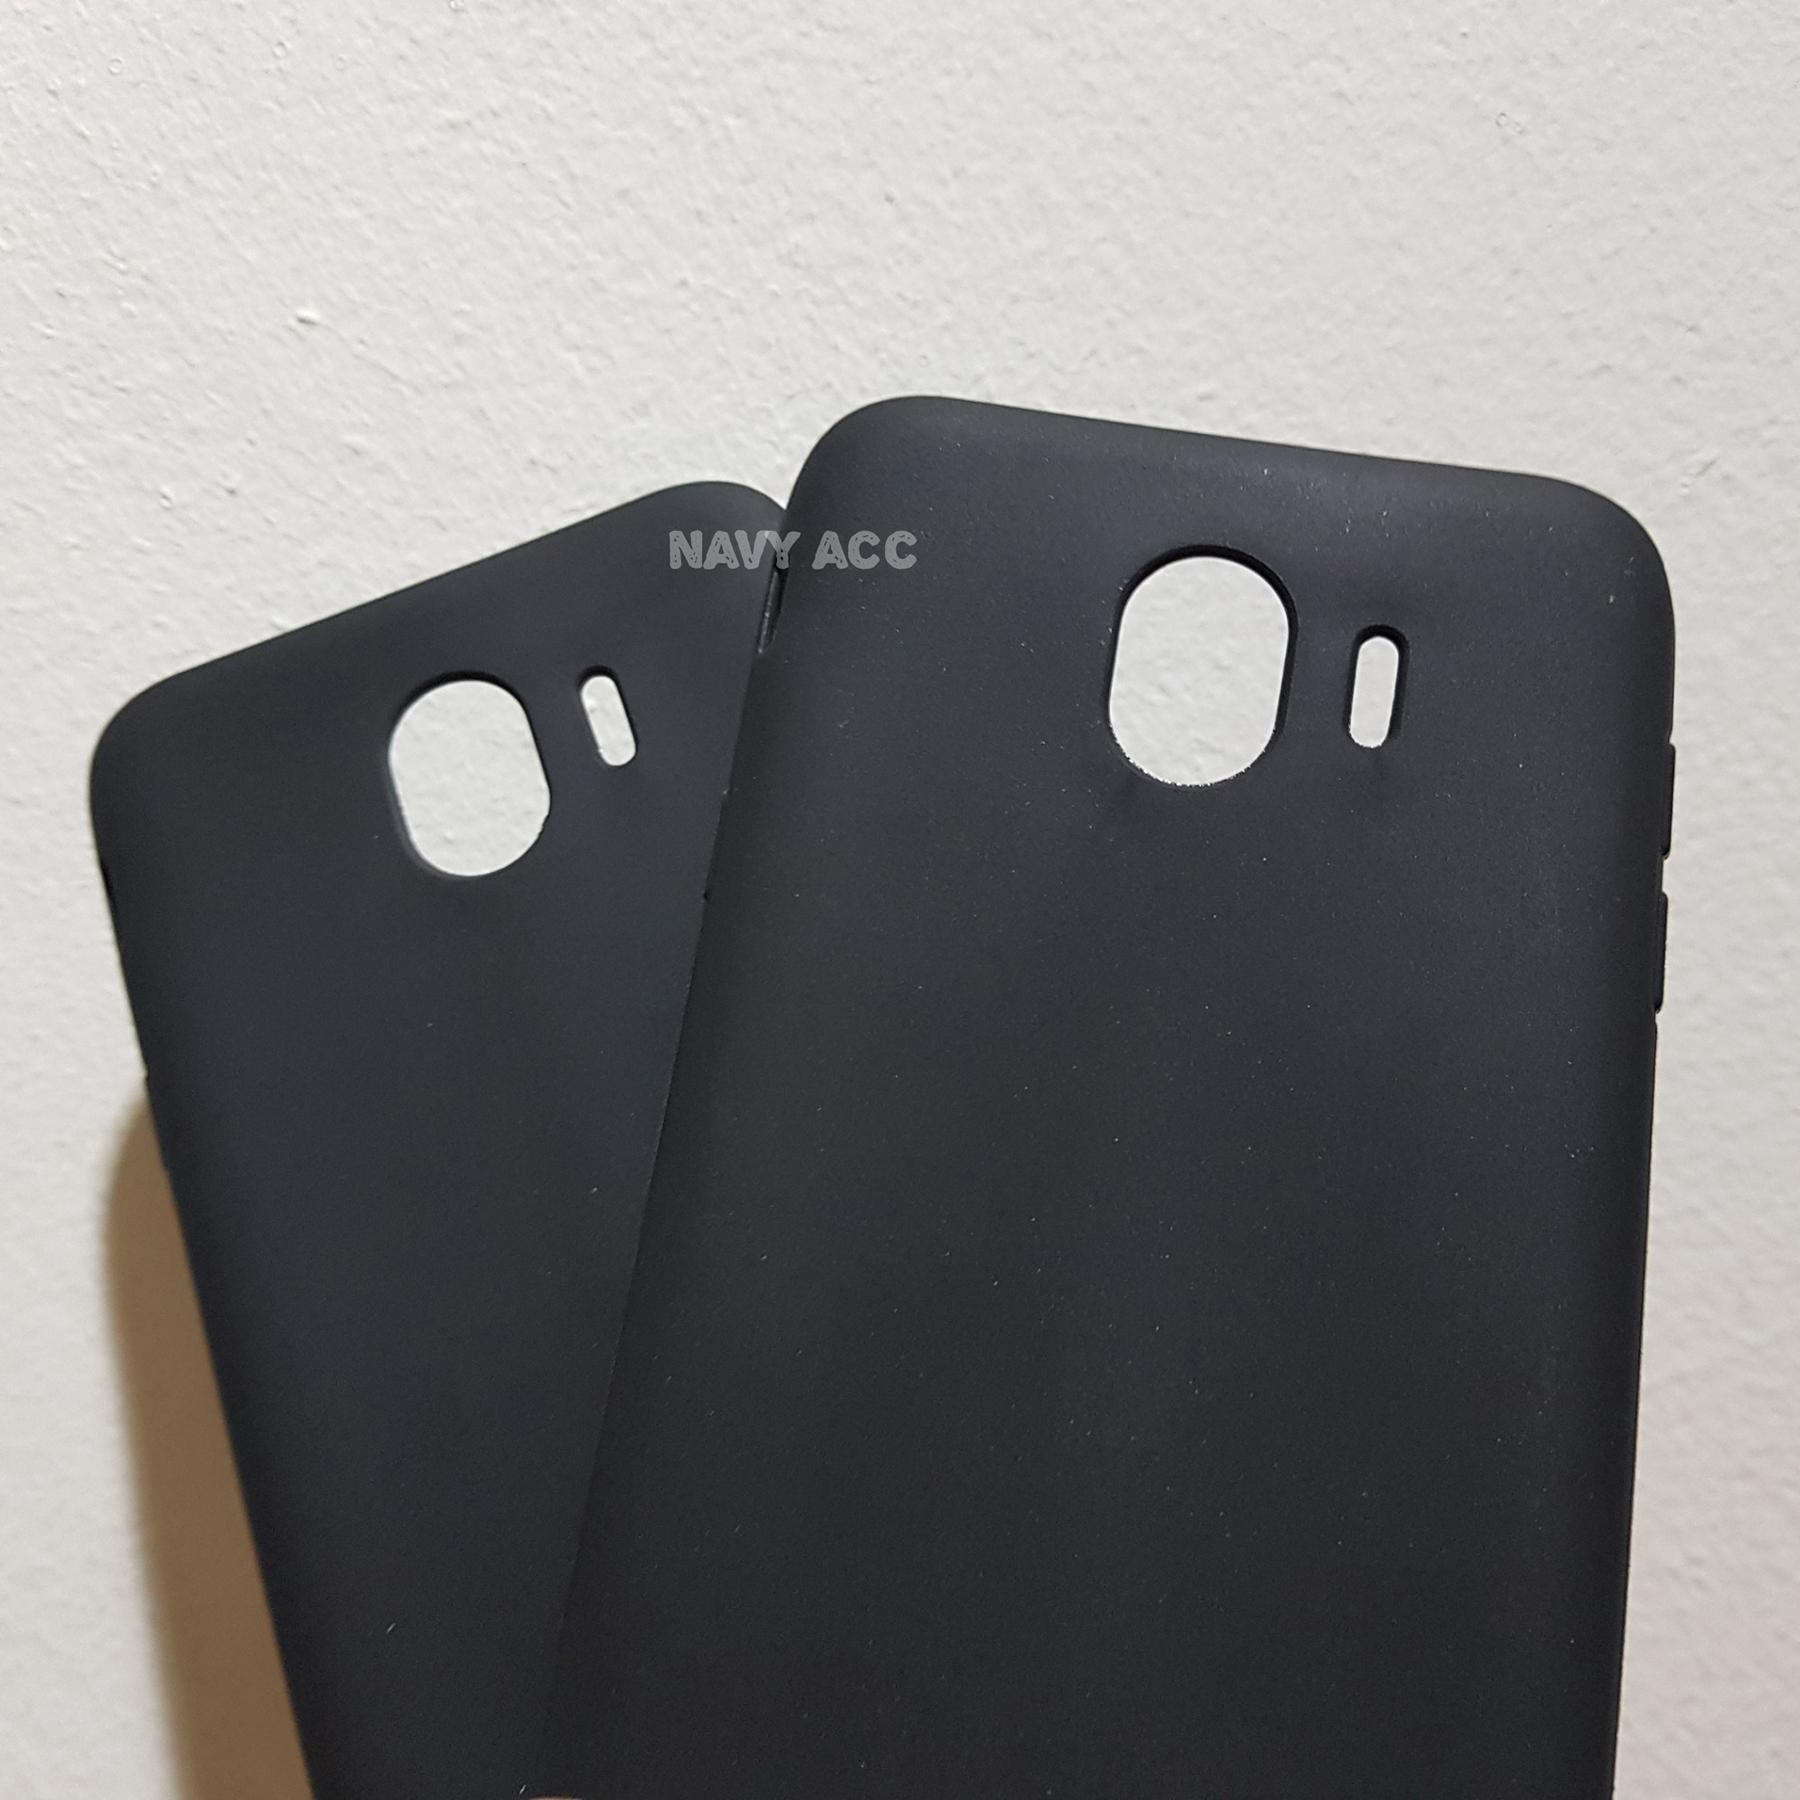 Case Samsung J4 2018 - Softcase SILICON THIN Doff BLACK MATTE J4 - 2 ...